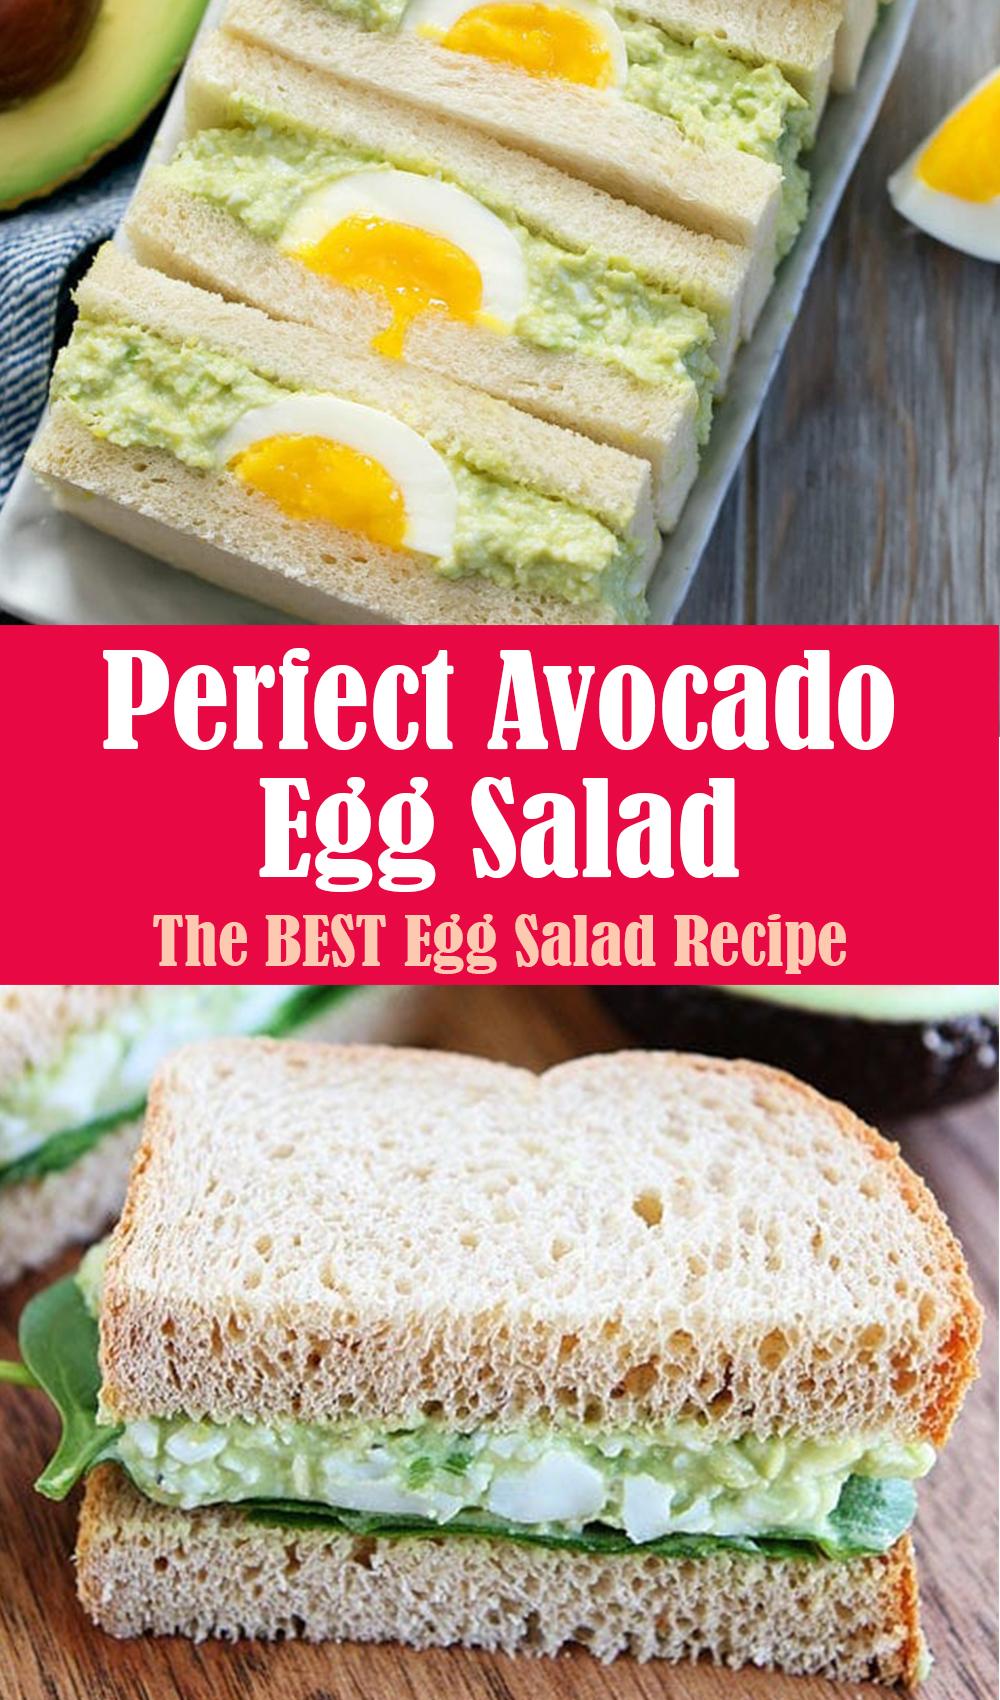 Perfect Avocado Egg Salad